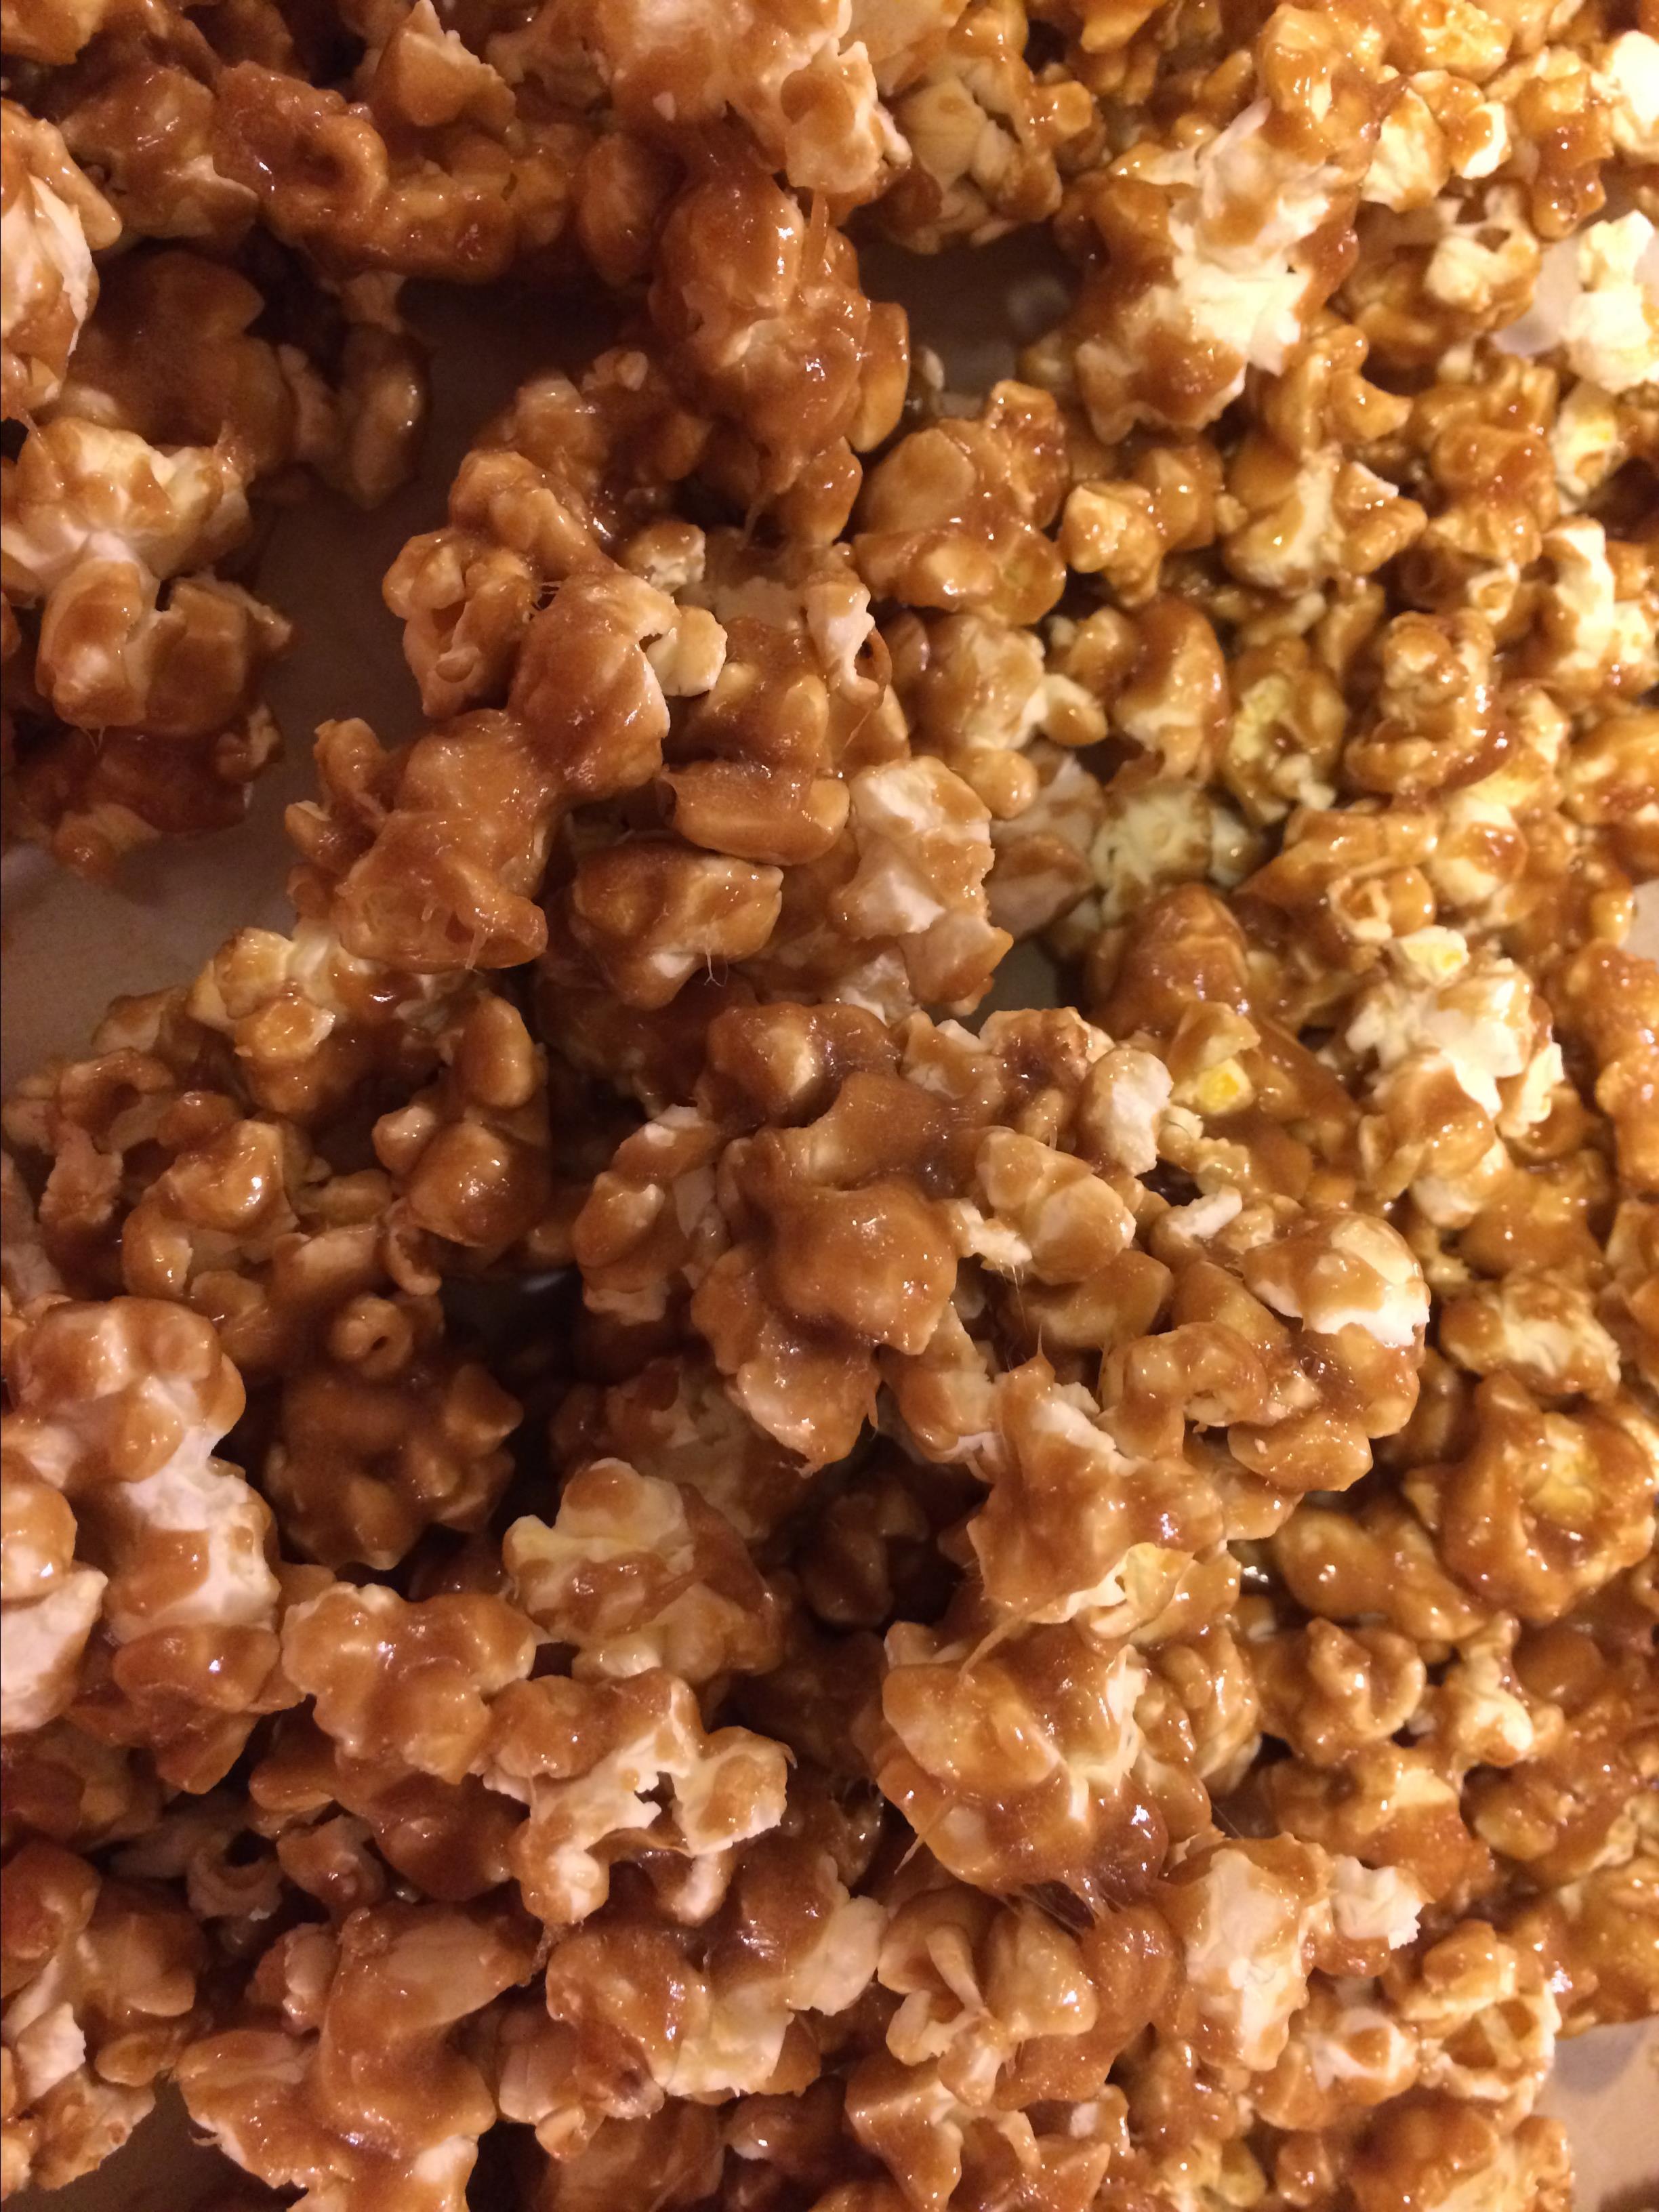 Microwave Caramel Popcorn